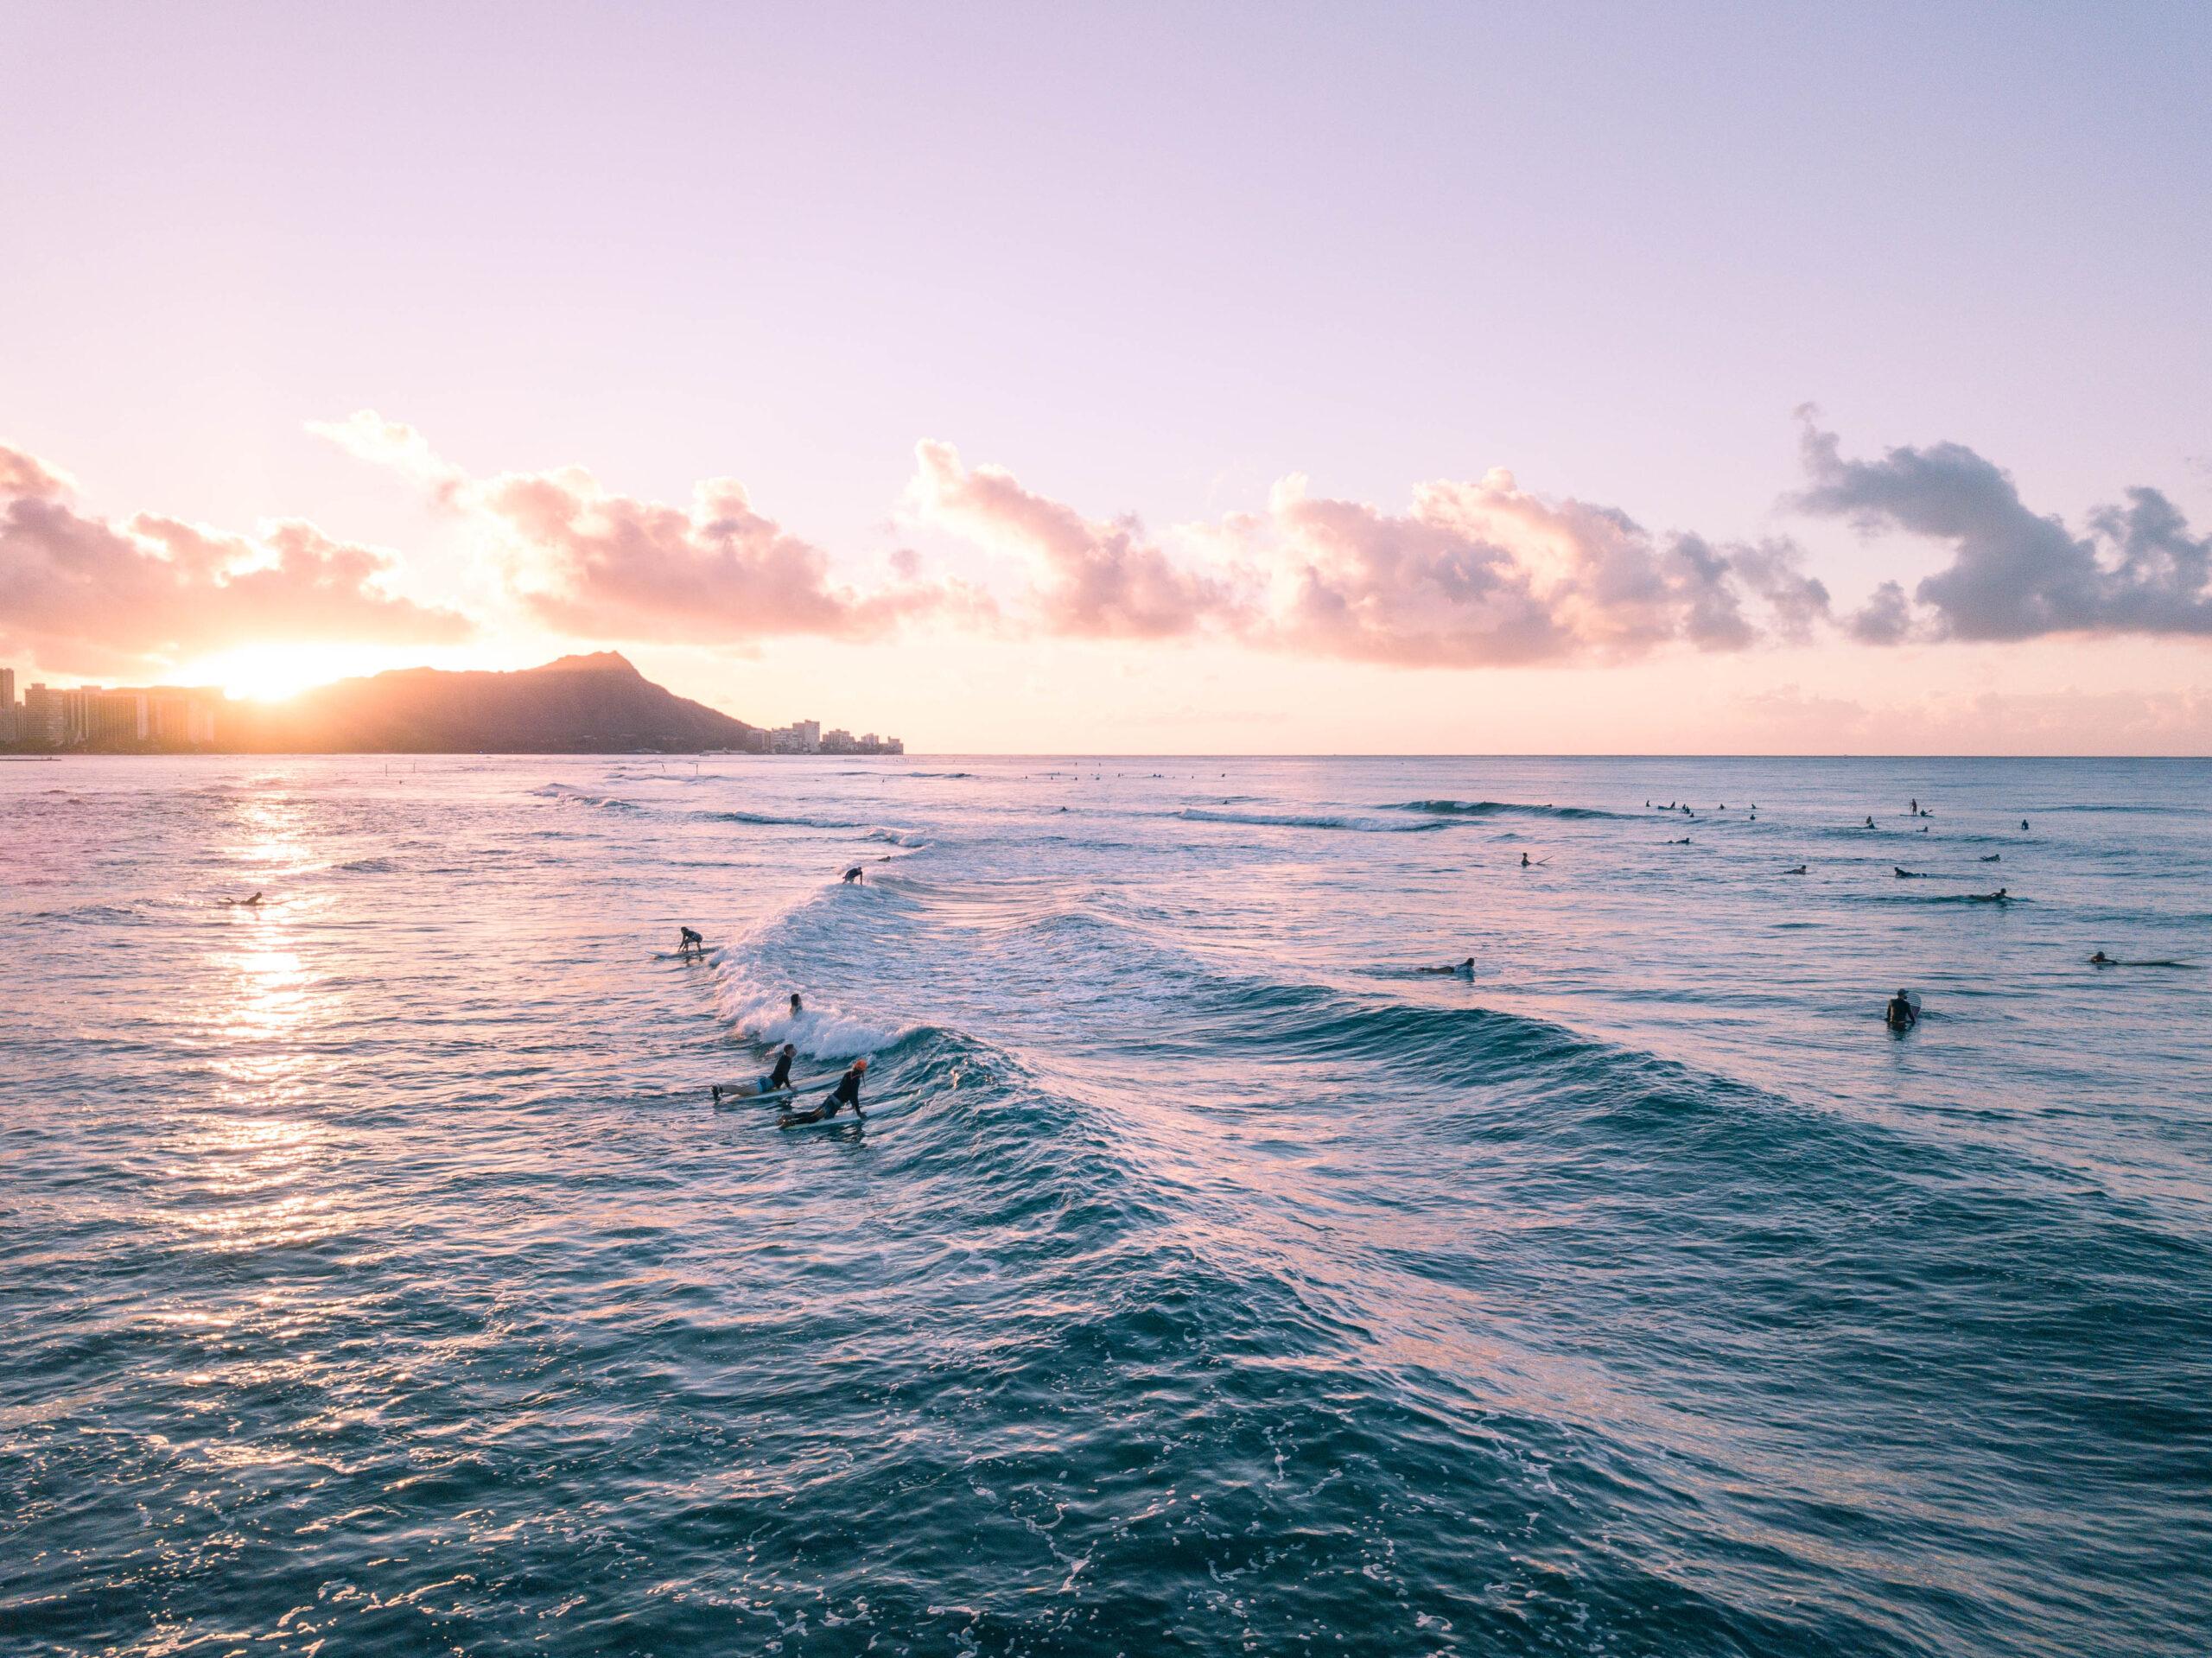 Hawaii Photos: Honolulu Sunrise - Dreaming of a Hawaii vacation?I'm sharing a photo diary of the sunrise in Honolulu!   Sunrise Honolulu - Hawaii Sunrise - Oahu Sunrise-Hawaii Vacation